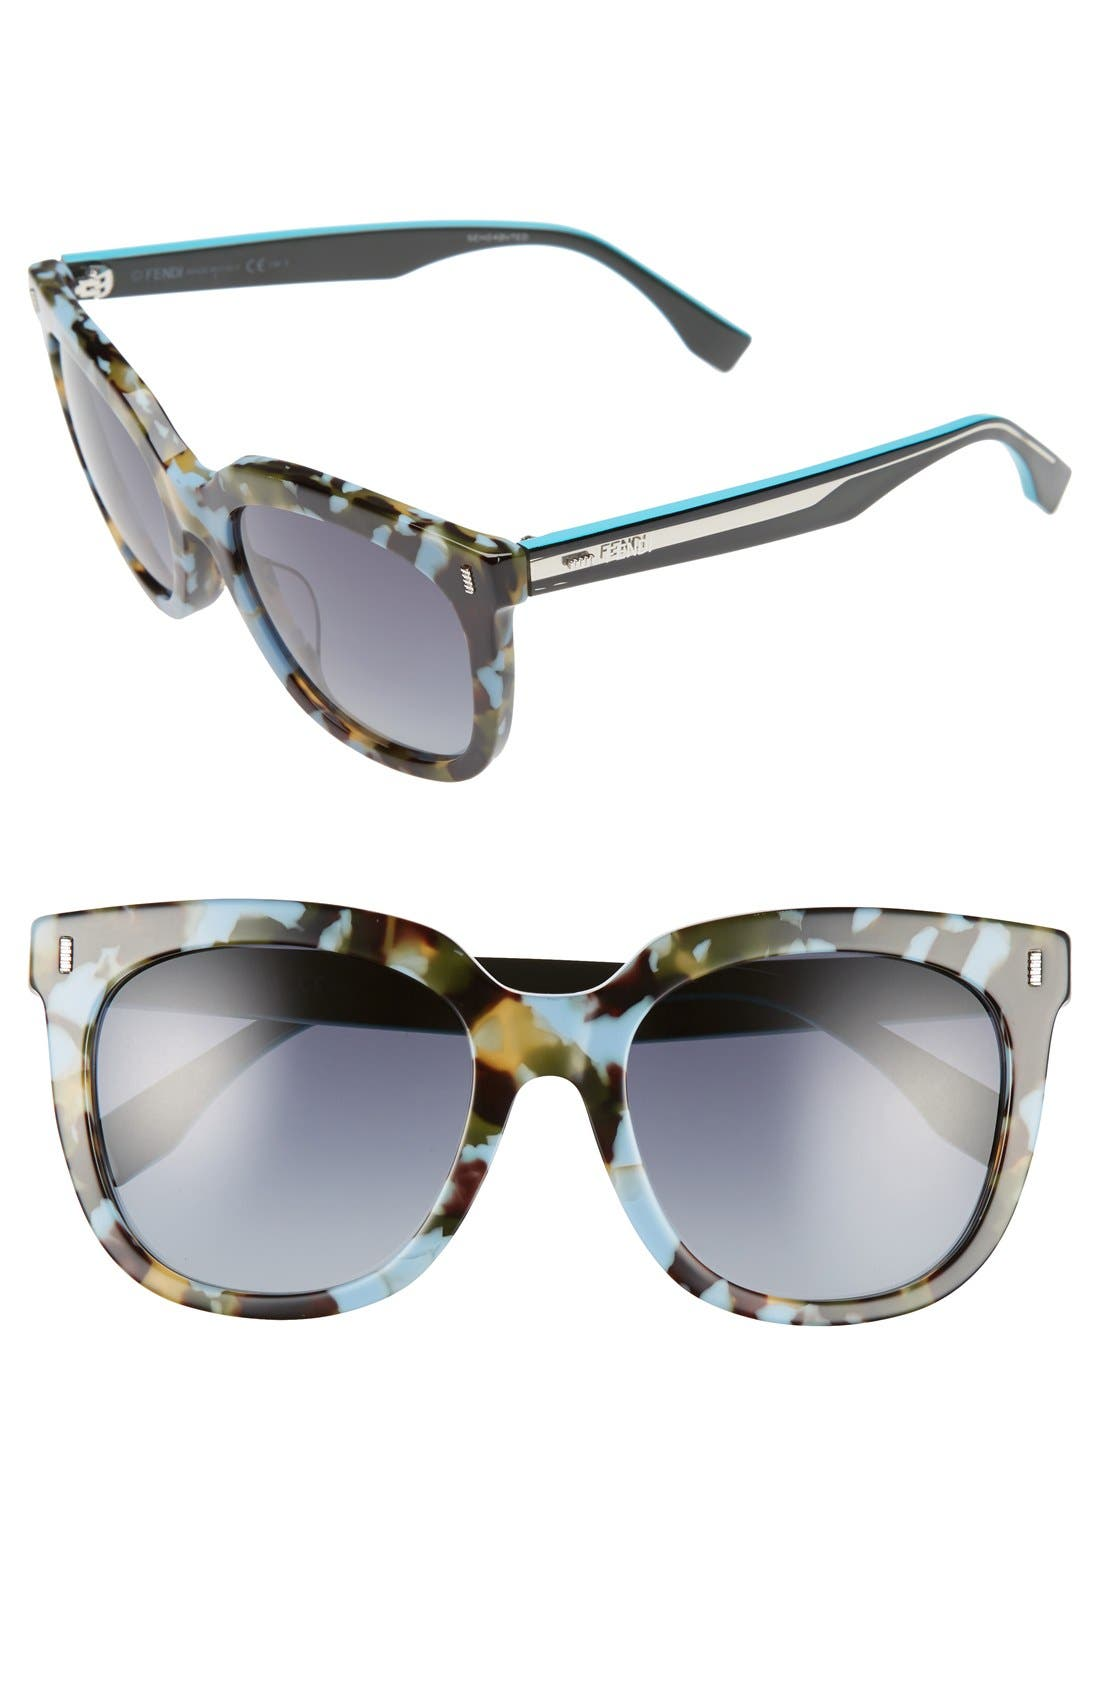 54mm Retro Sunglasses,                             Main thumbnail 1, color,